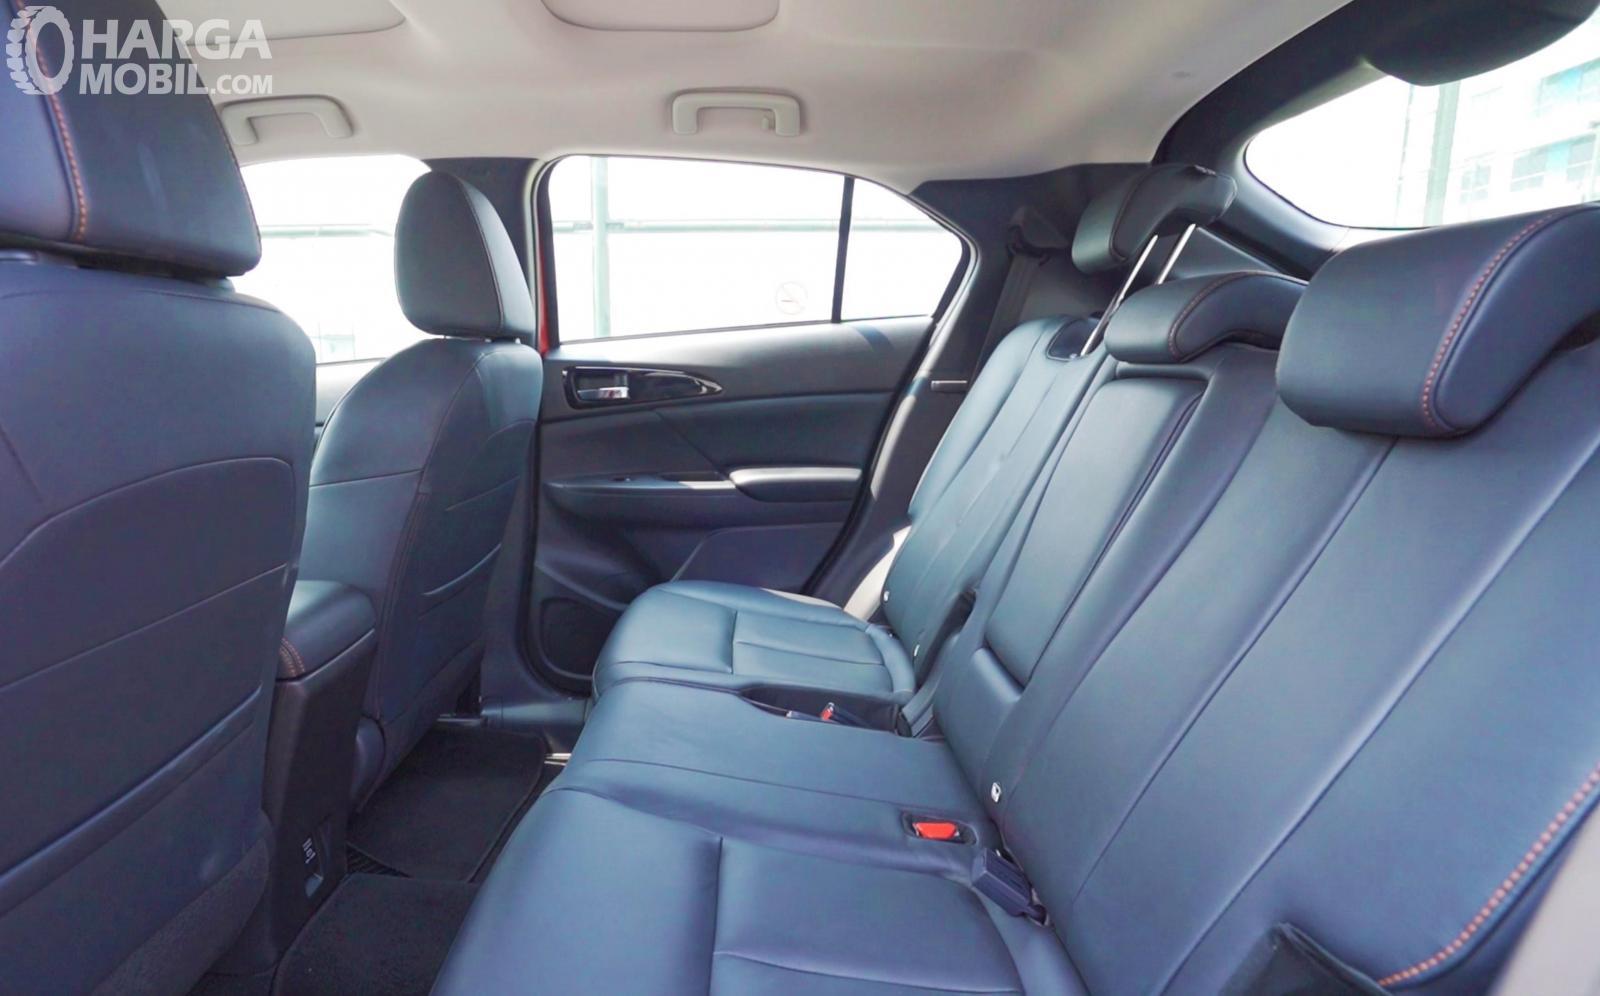 Foto kursi baris belakang Mitsubishi Eclipse Cross 2019